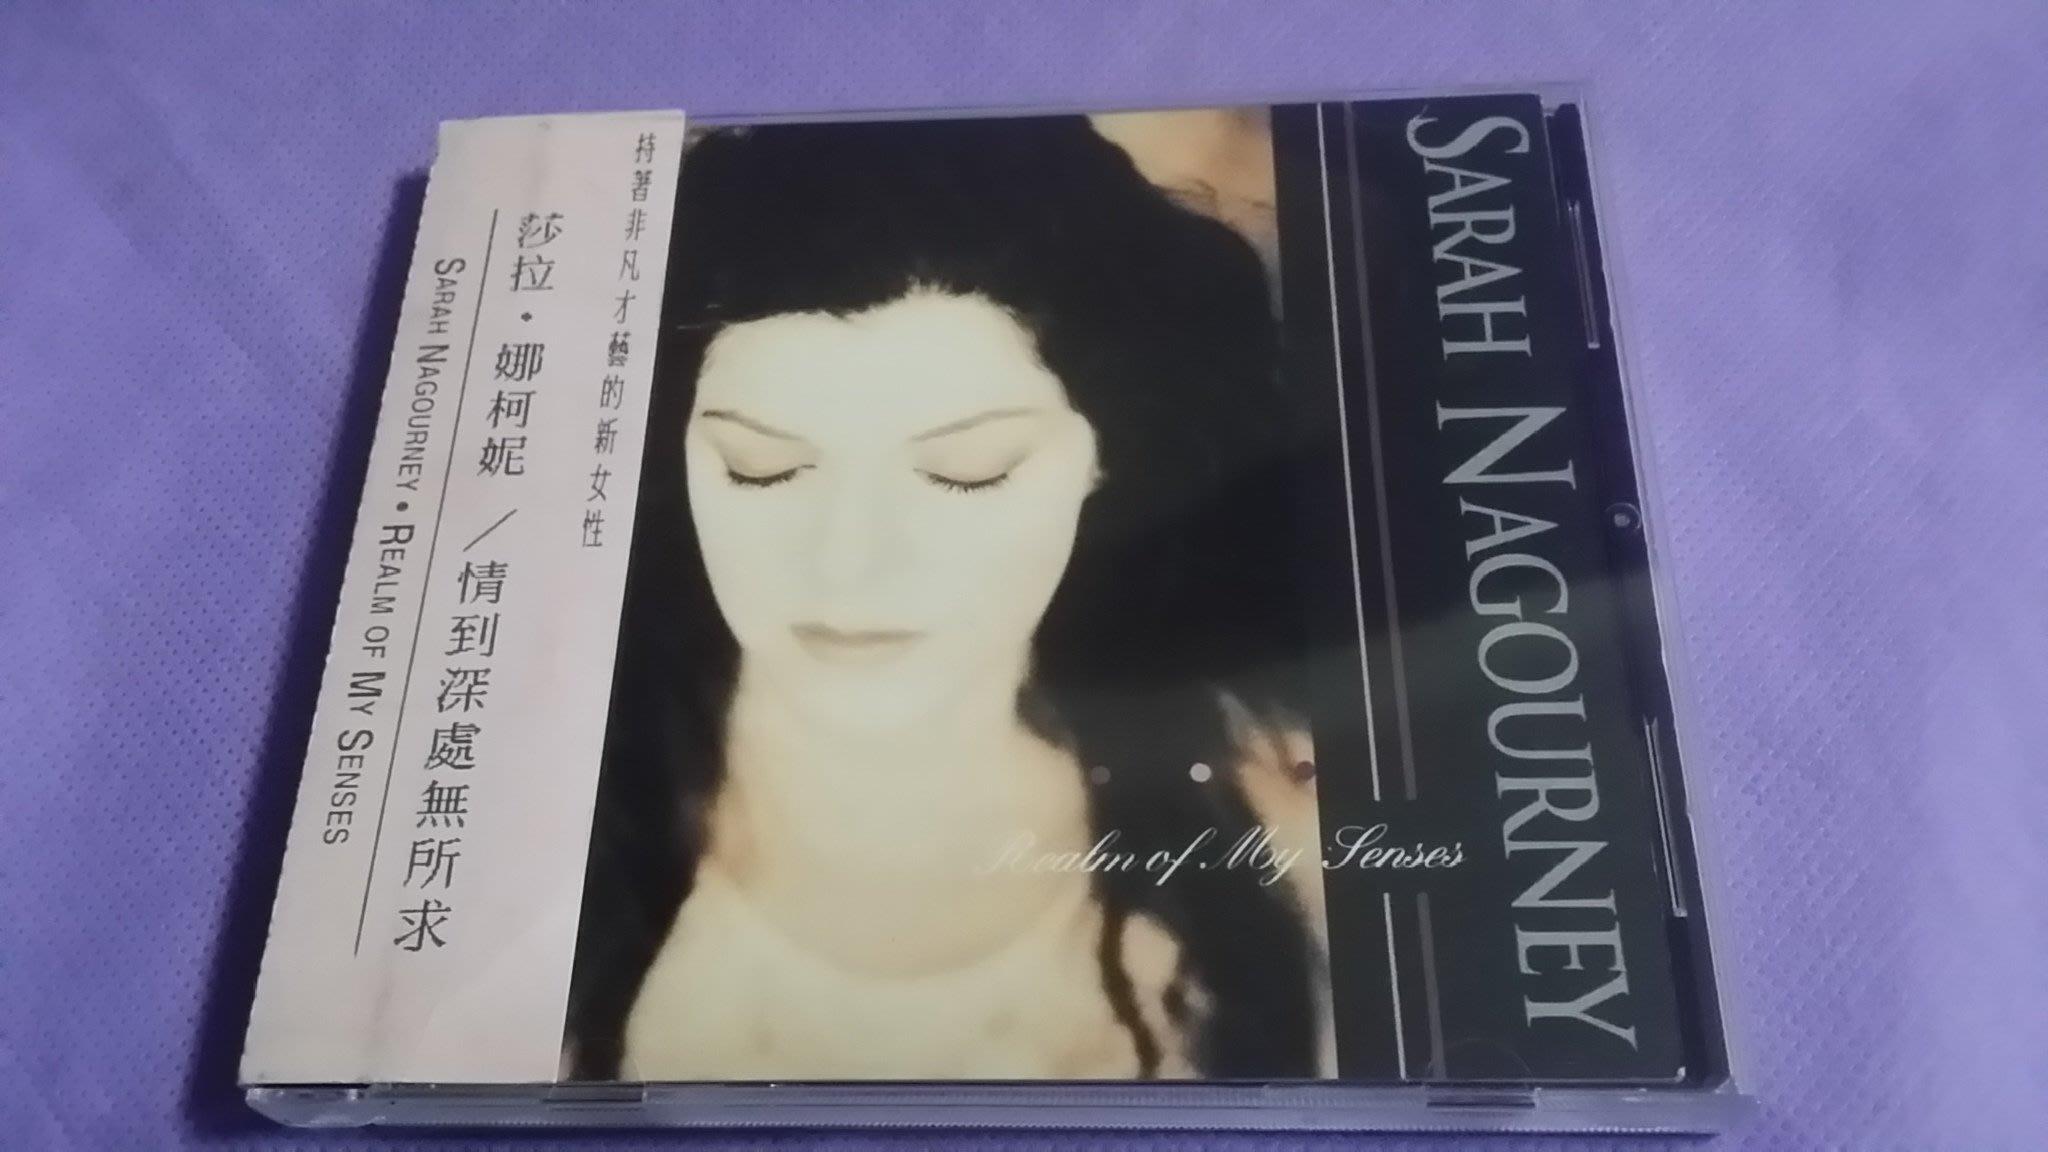 R西洋女(二手CD)莎拉娜柯妮~情到深處無所求~有側標~